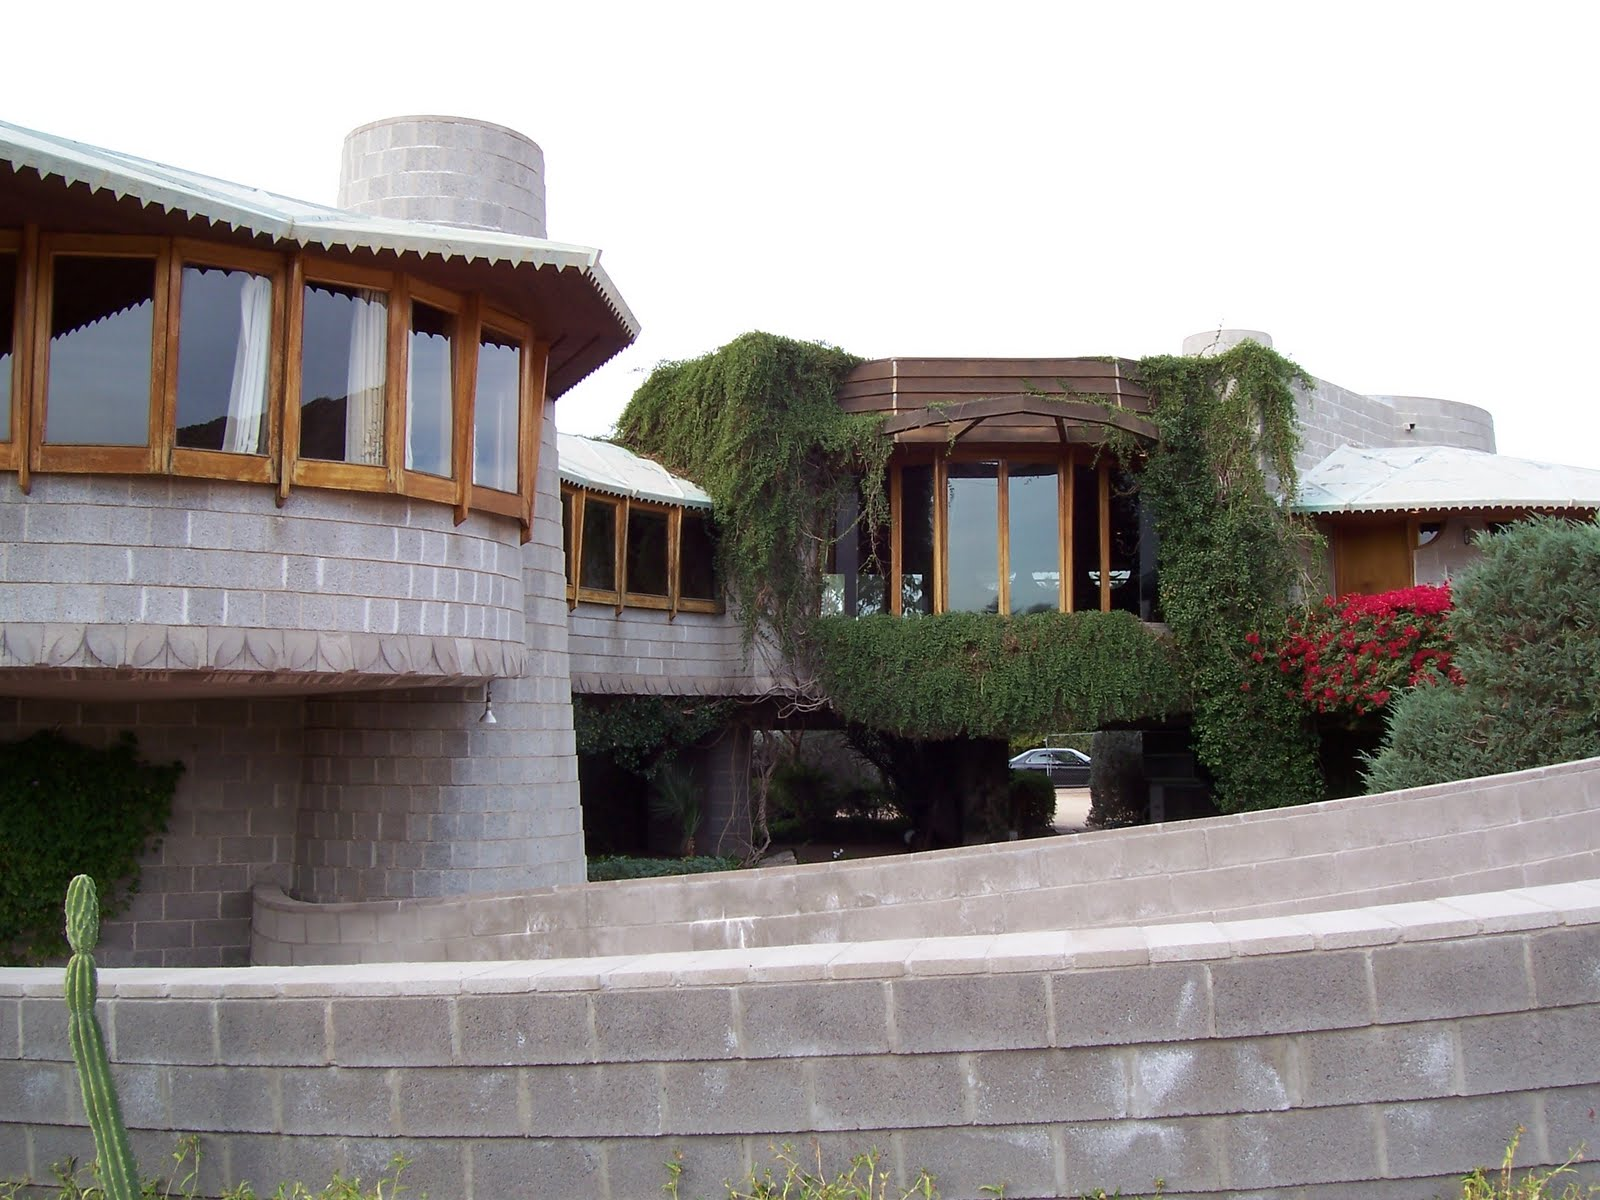 Frank-Lloyd-Wright-House-Phoenix-Arizona  Frank Llyod Wright House Preservation is Assured David Wright House 003